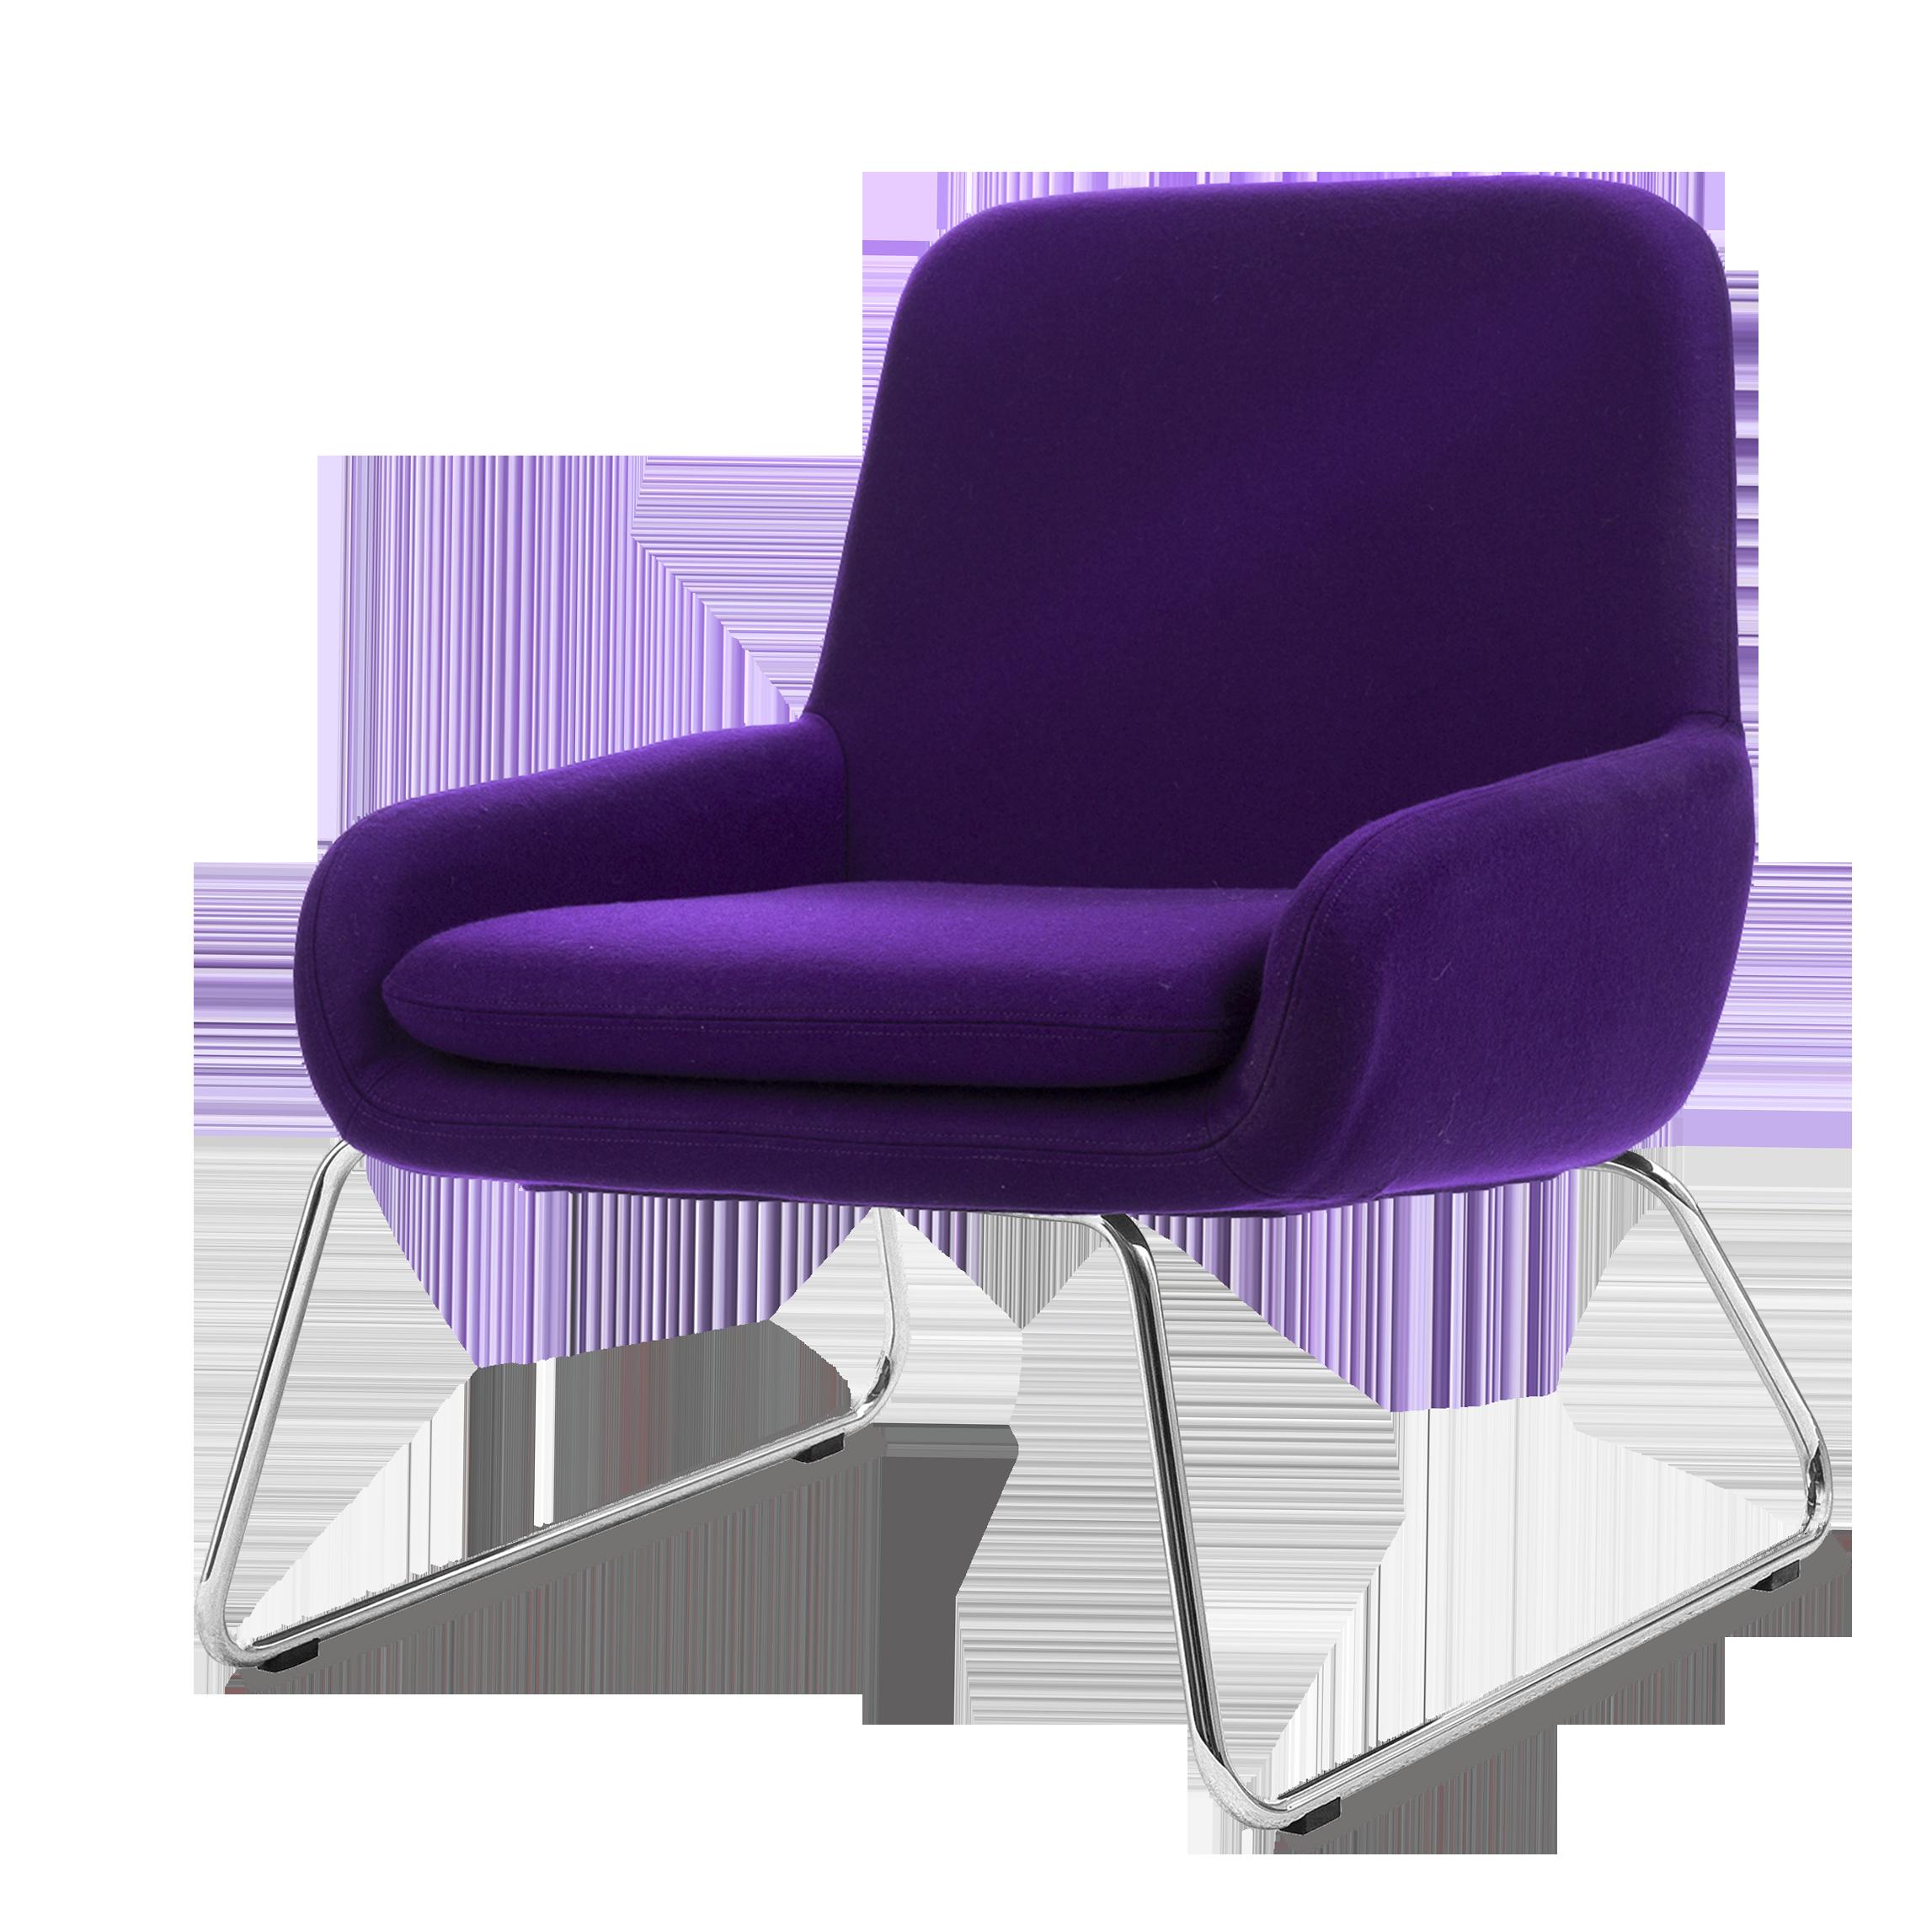 Кресло Softline 15576476 от Cosmorelax